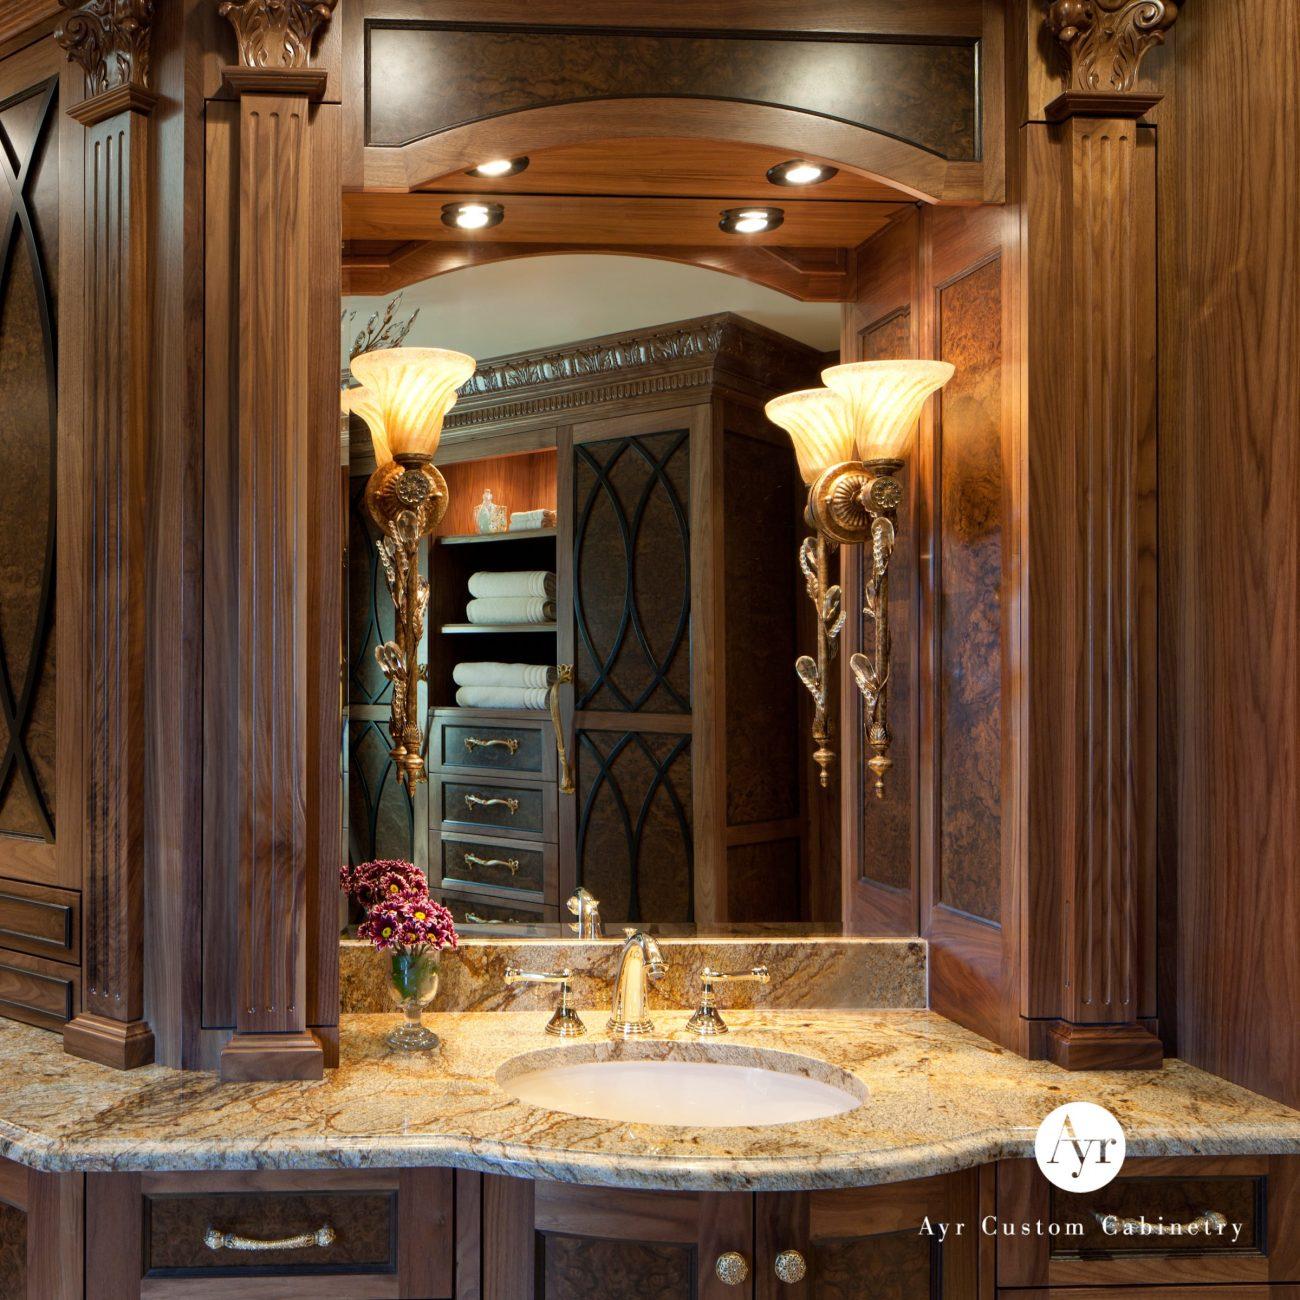 custom bathroom cabinets, product spotlight 1